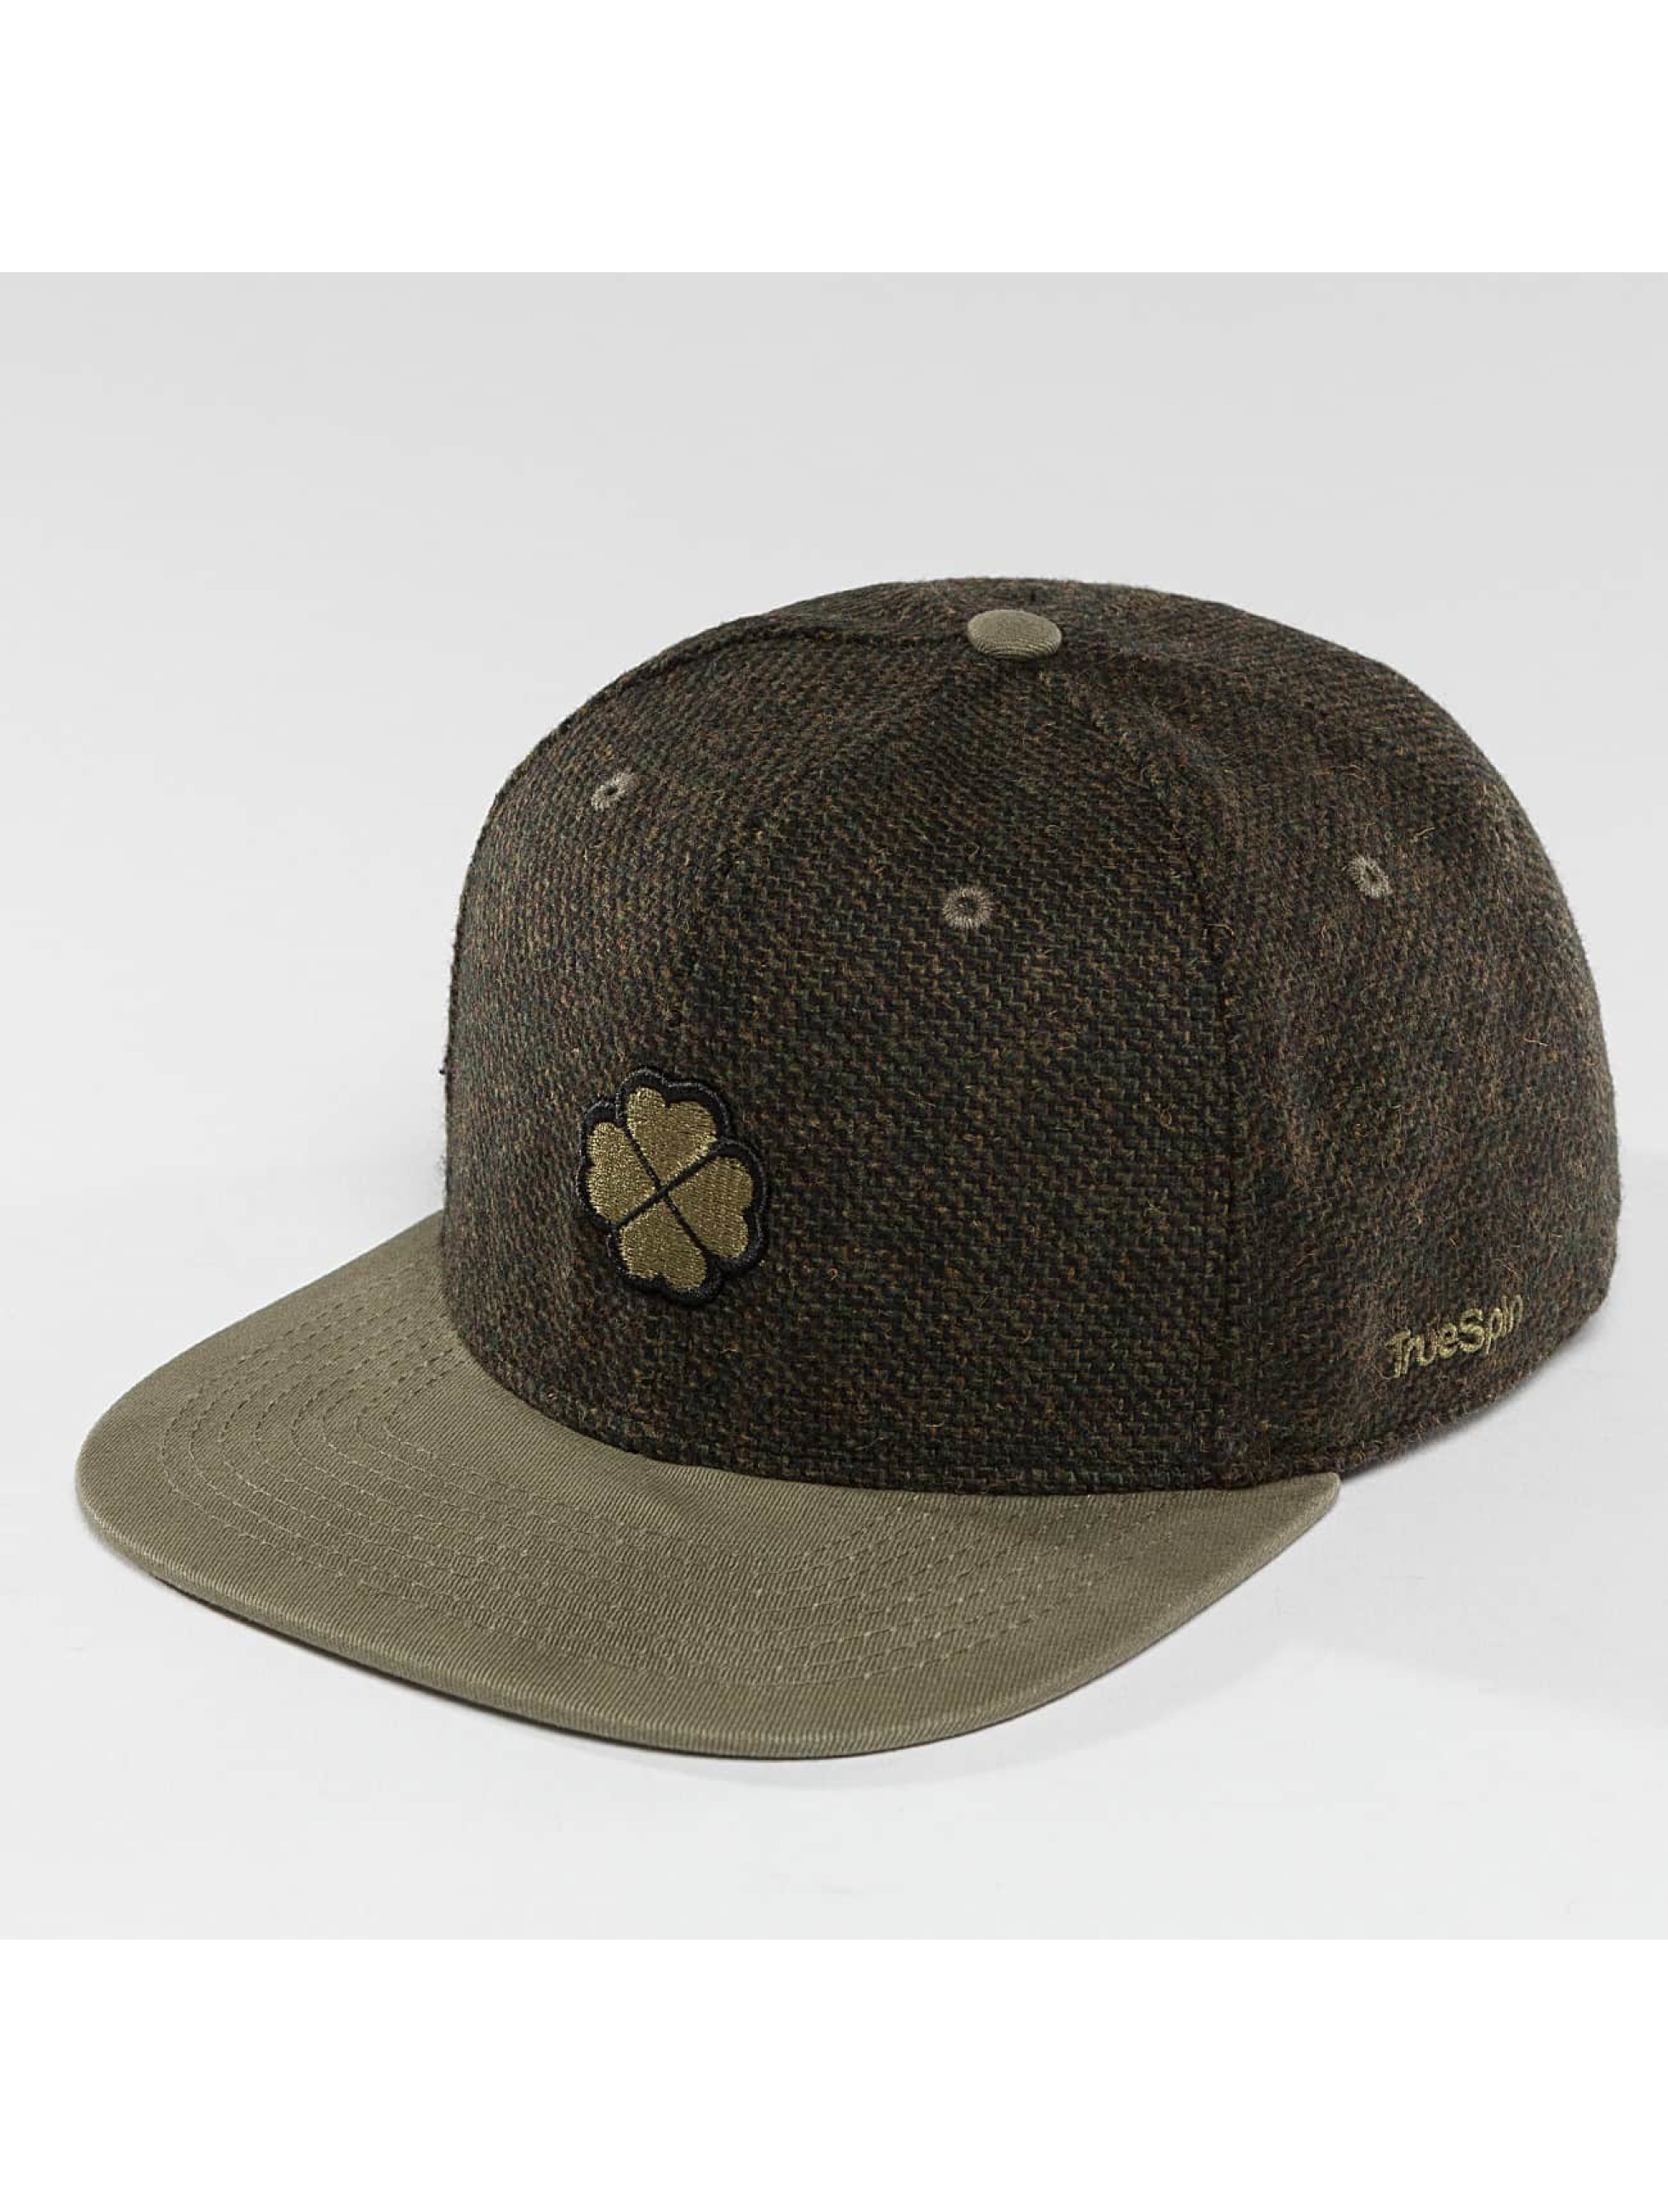 TrueSpin hoed Shamy groen